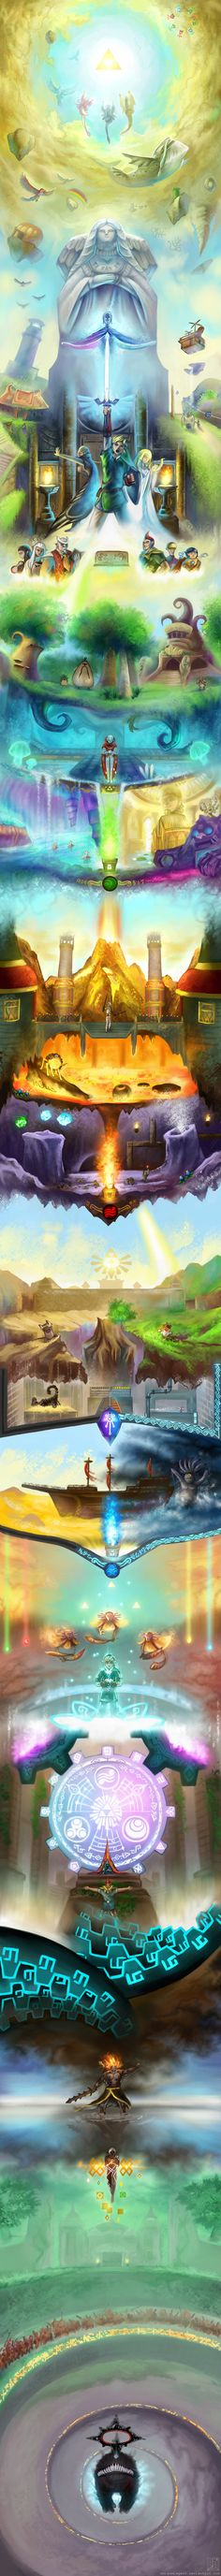 Skyward Sword Illustration